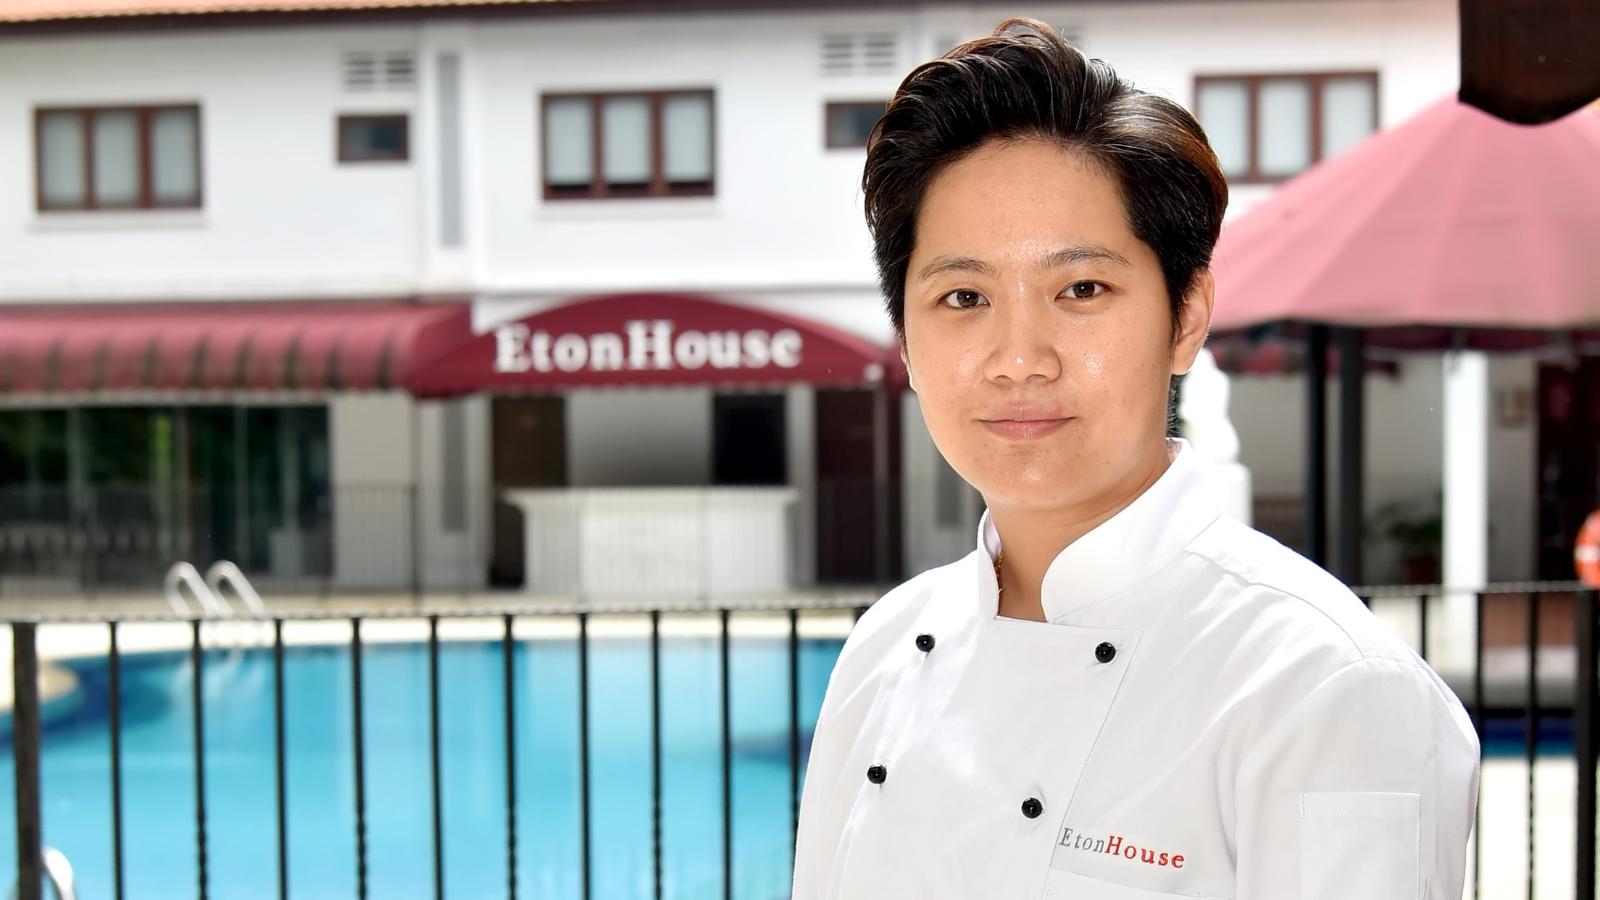 EtonHouse Inspirations: Jamie Goh, Resident Chef at EtonHouse